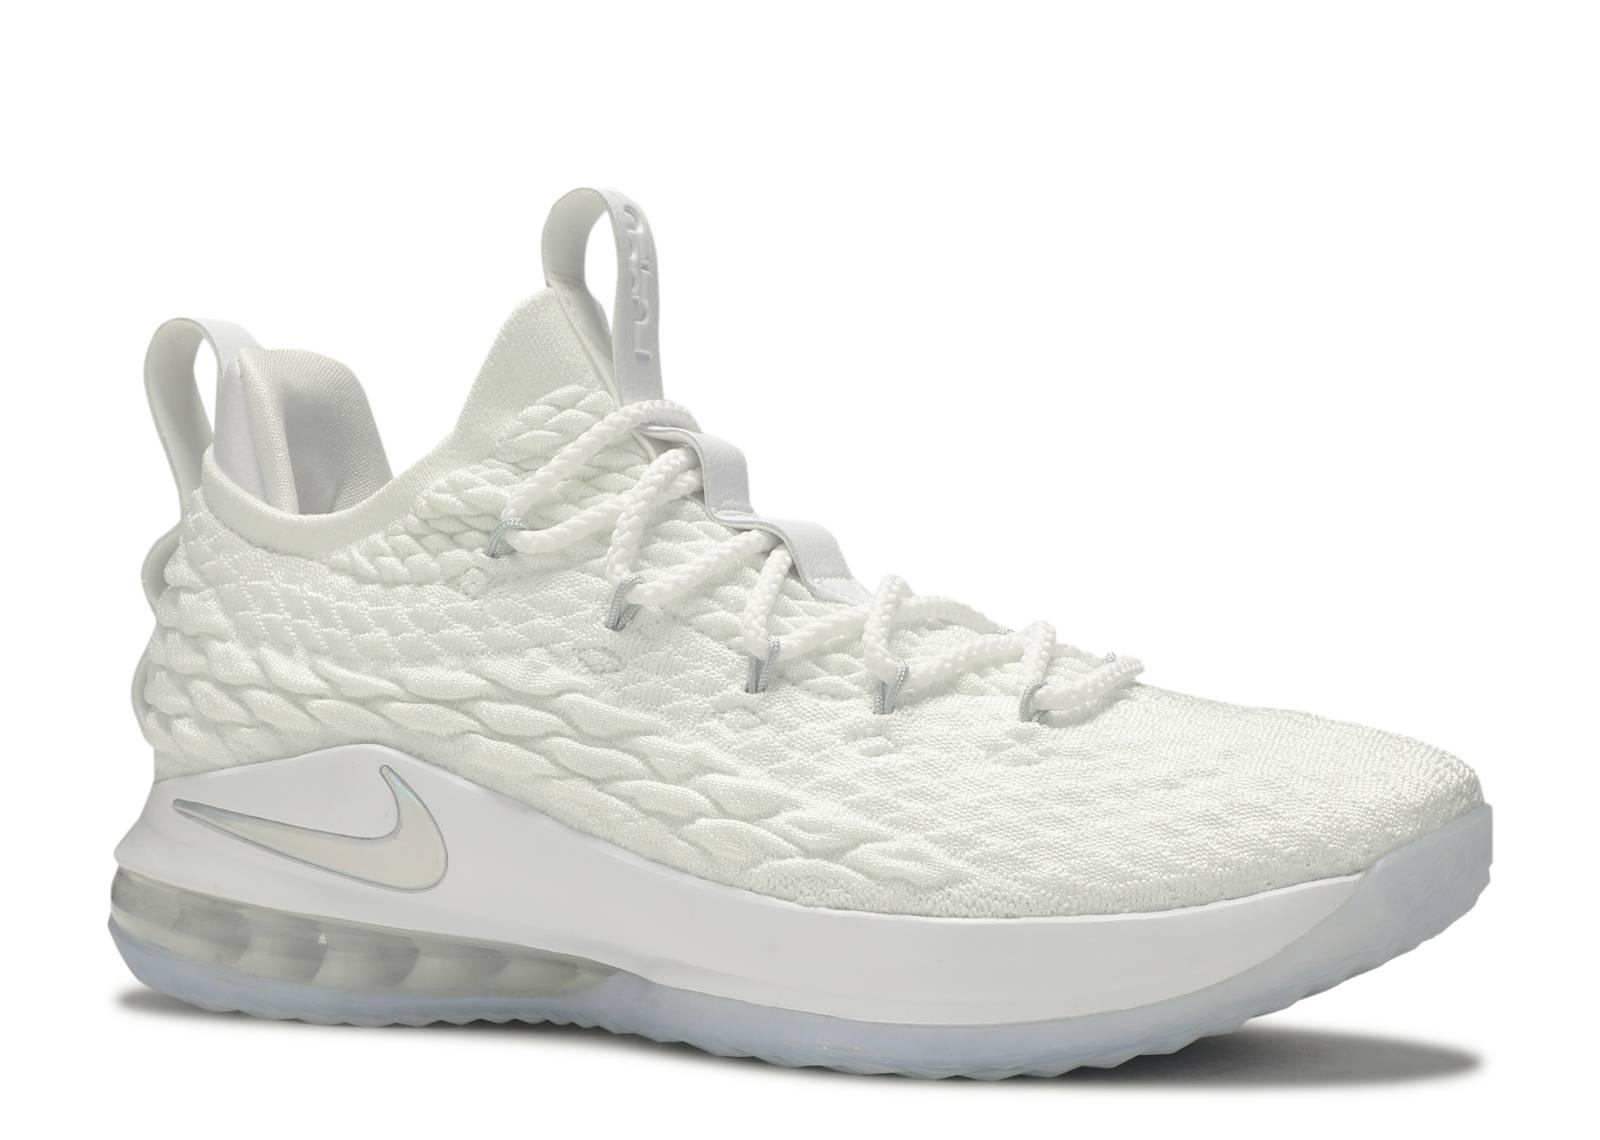 7e6321b71e7a Nike LeBron 15 Low - Nike - AO1755 100 - white metallic silver ...